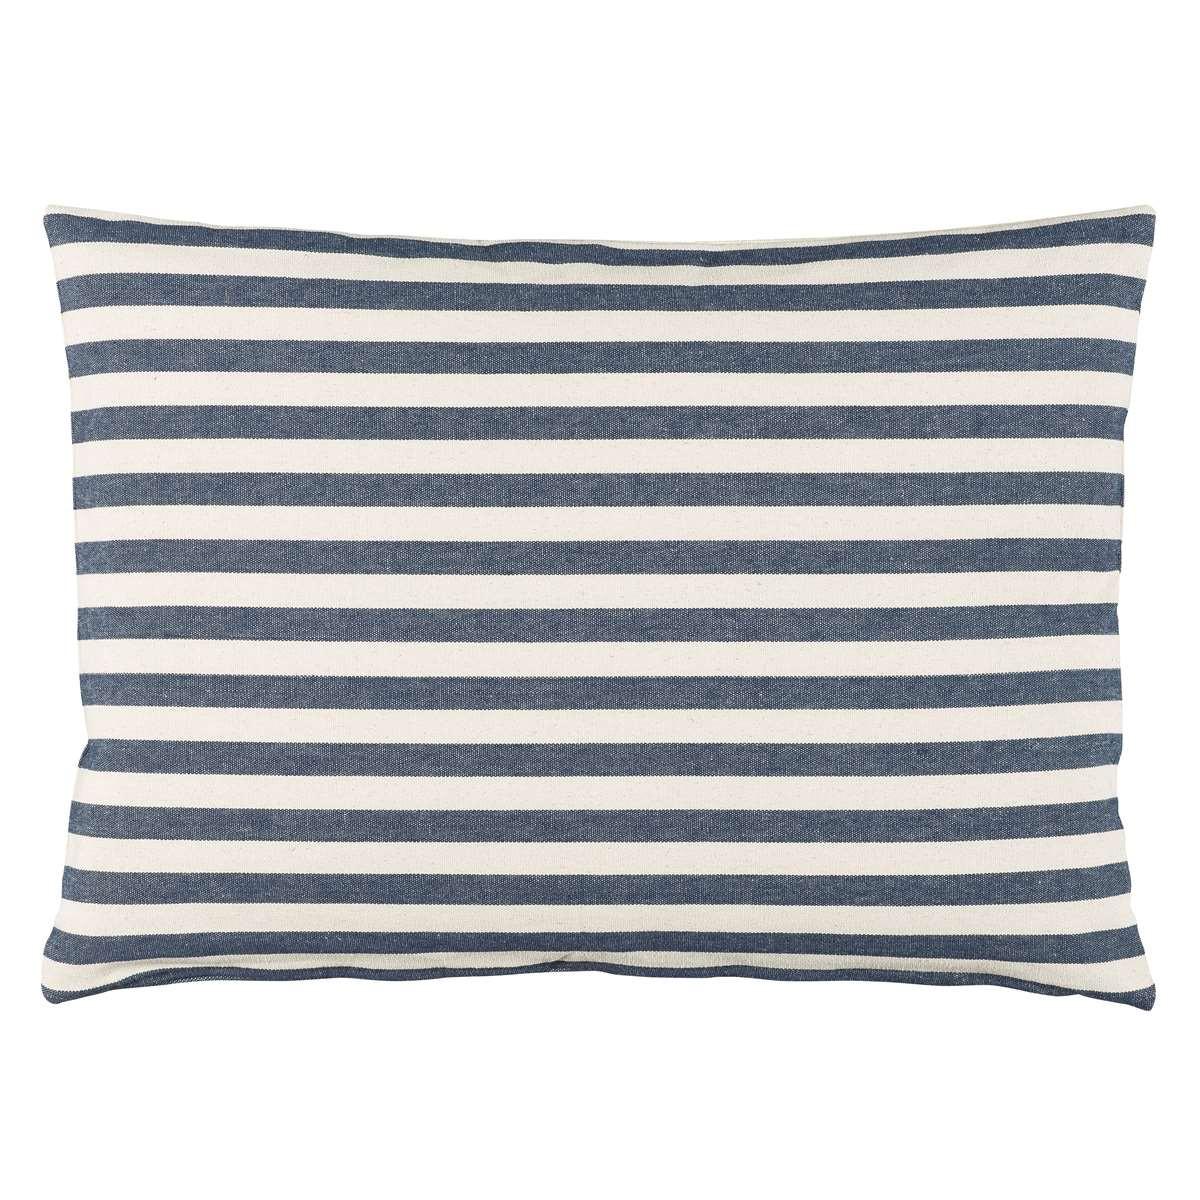 ib laursen kissenh lle 50x70 streifen blau wei. Black Bedroom Furniture Sets. Home Design Ideas